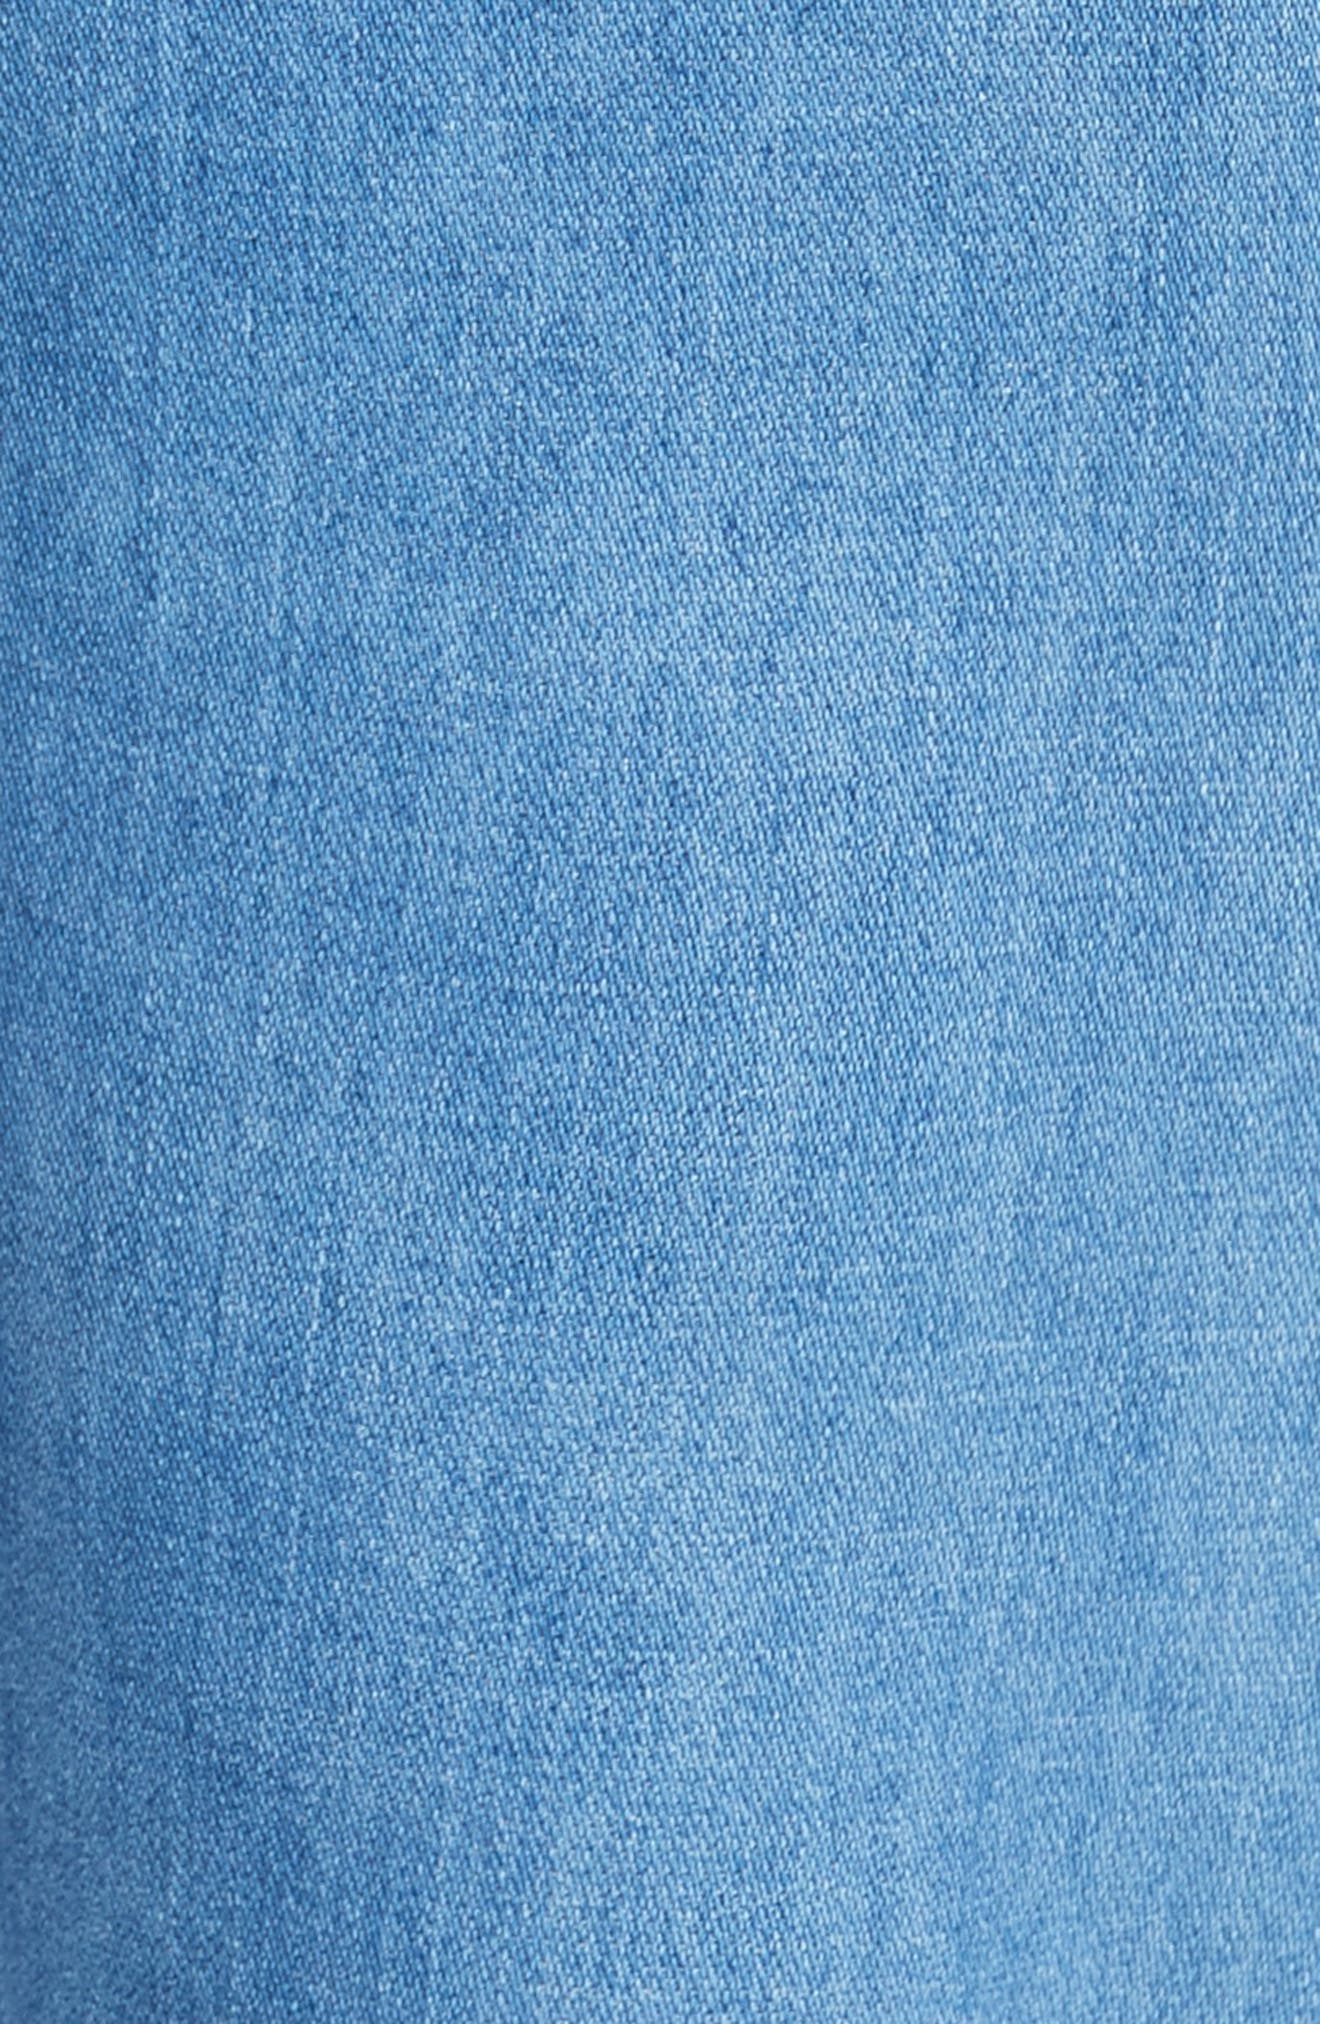 Petit New Standard Slim Fit Jeans,                             Alternate thumbnail 4, color,                             461